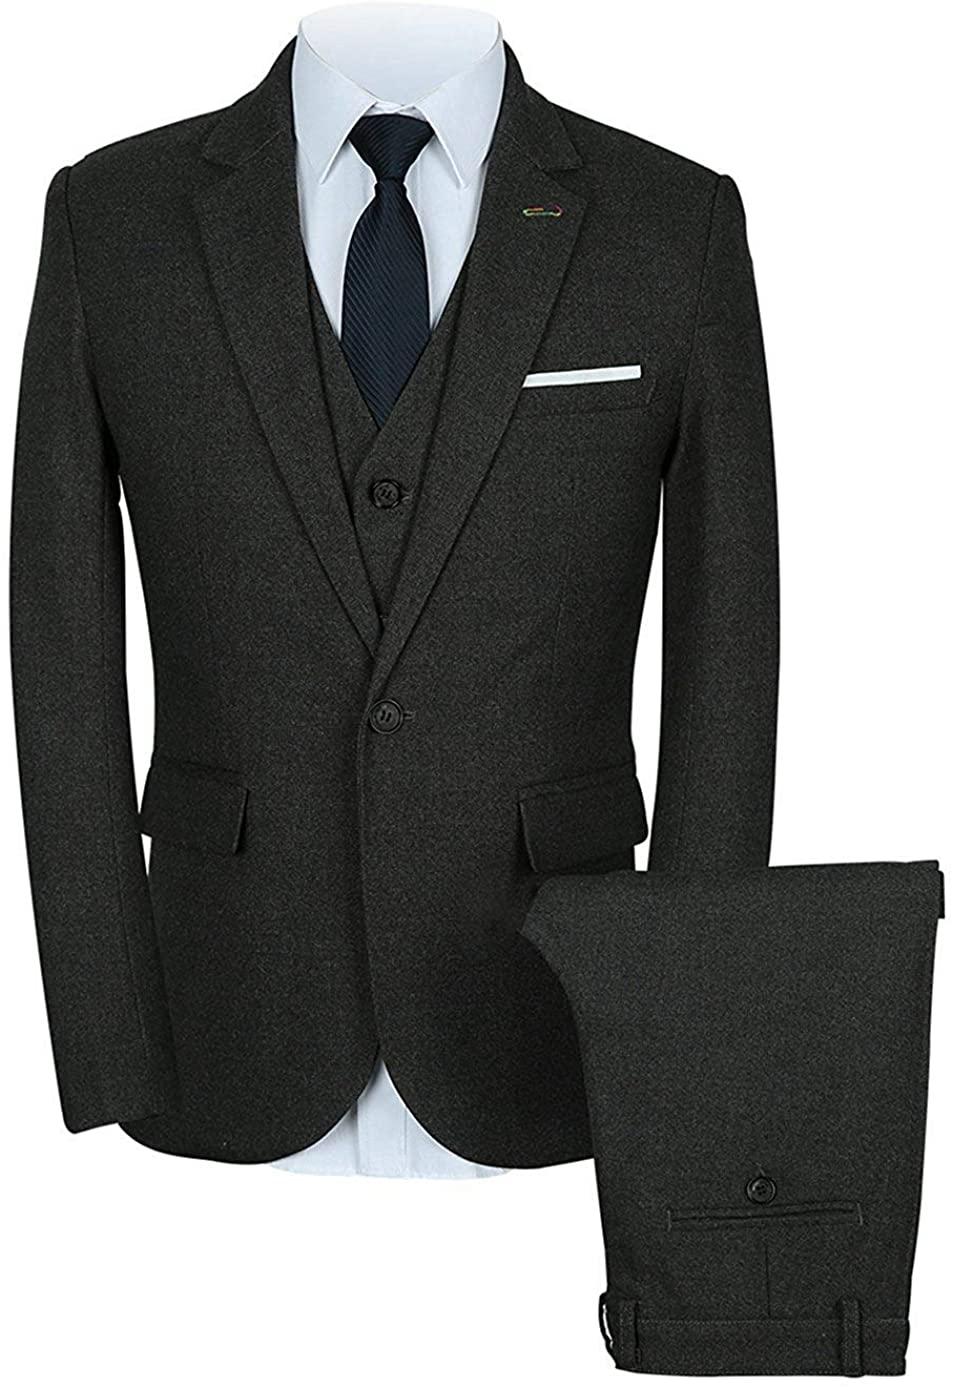 Mens Suit 3 Pieces Notched Lapel Wool Blend Formal Wedding Prom Tuxedos(Blazer+Vest+Pants)(Grey,50S